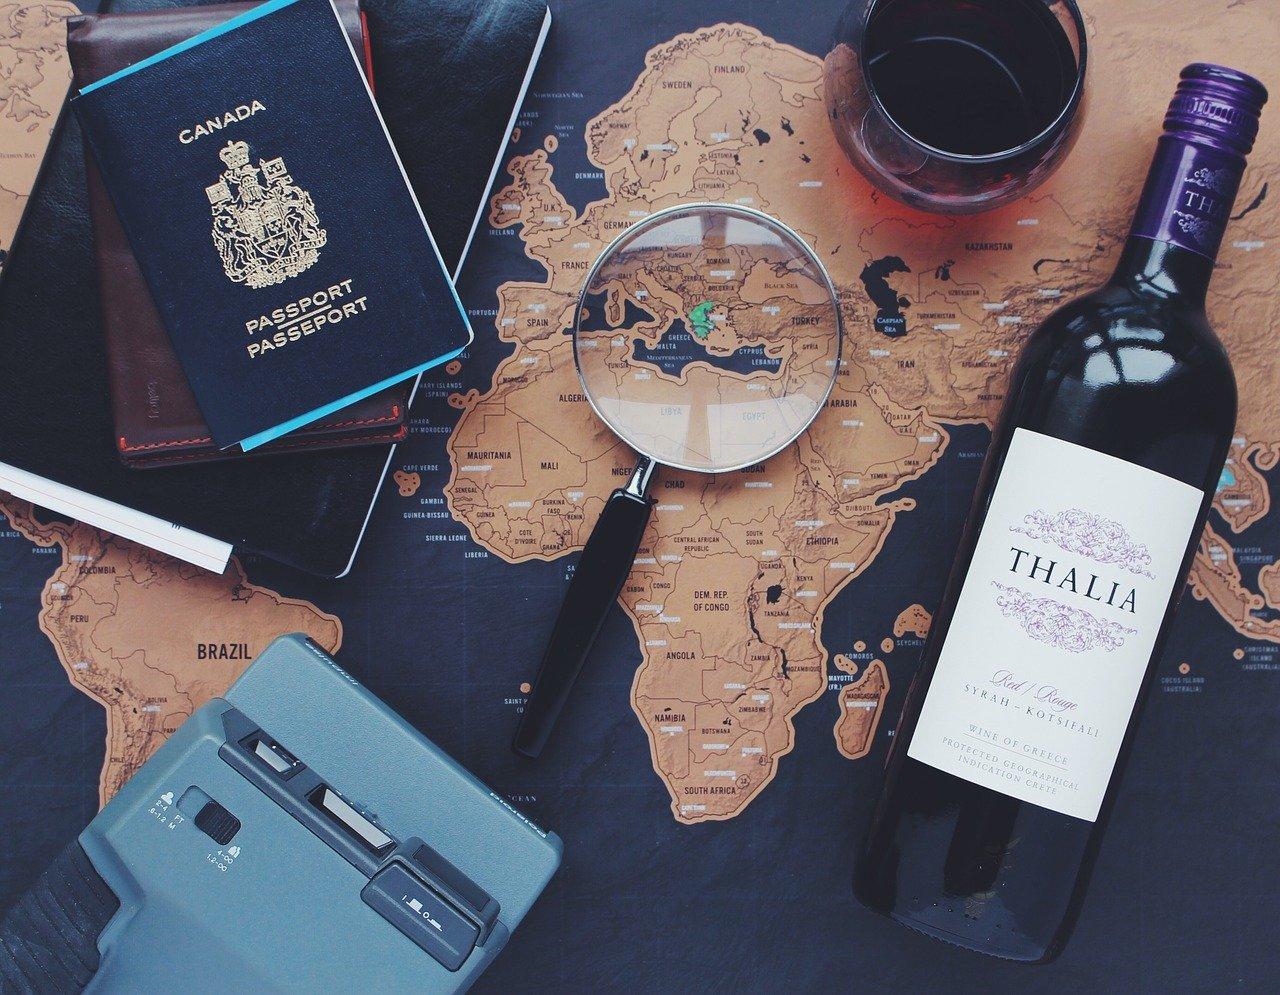 passaporte, mapa, vinho e taça